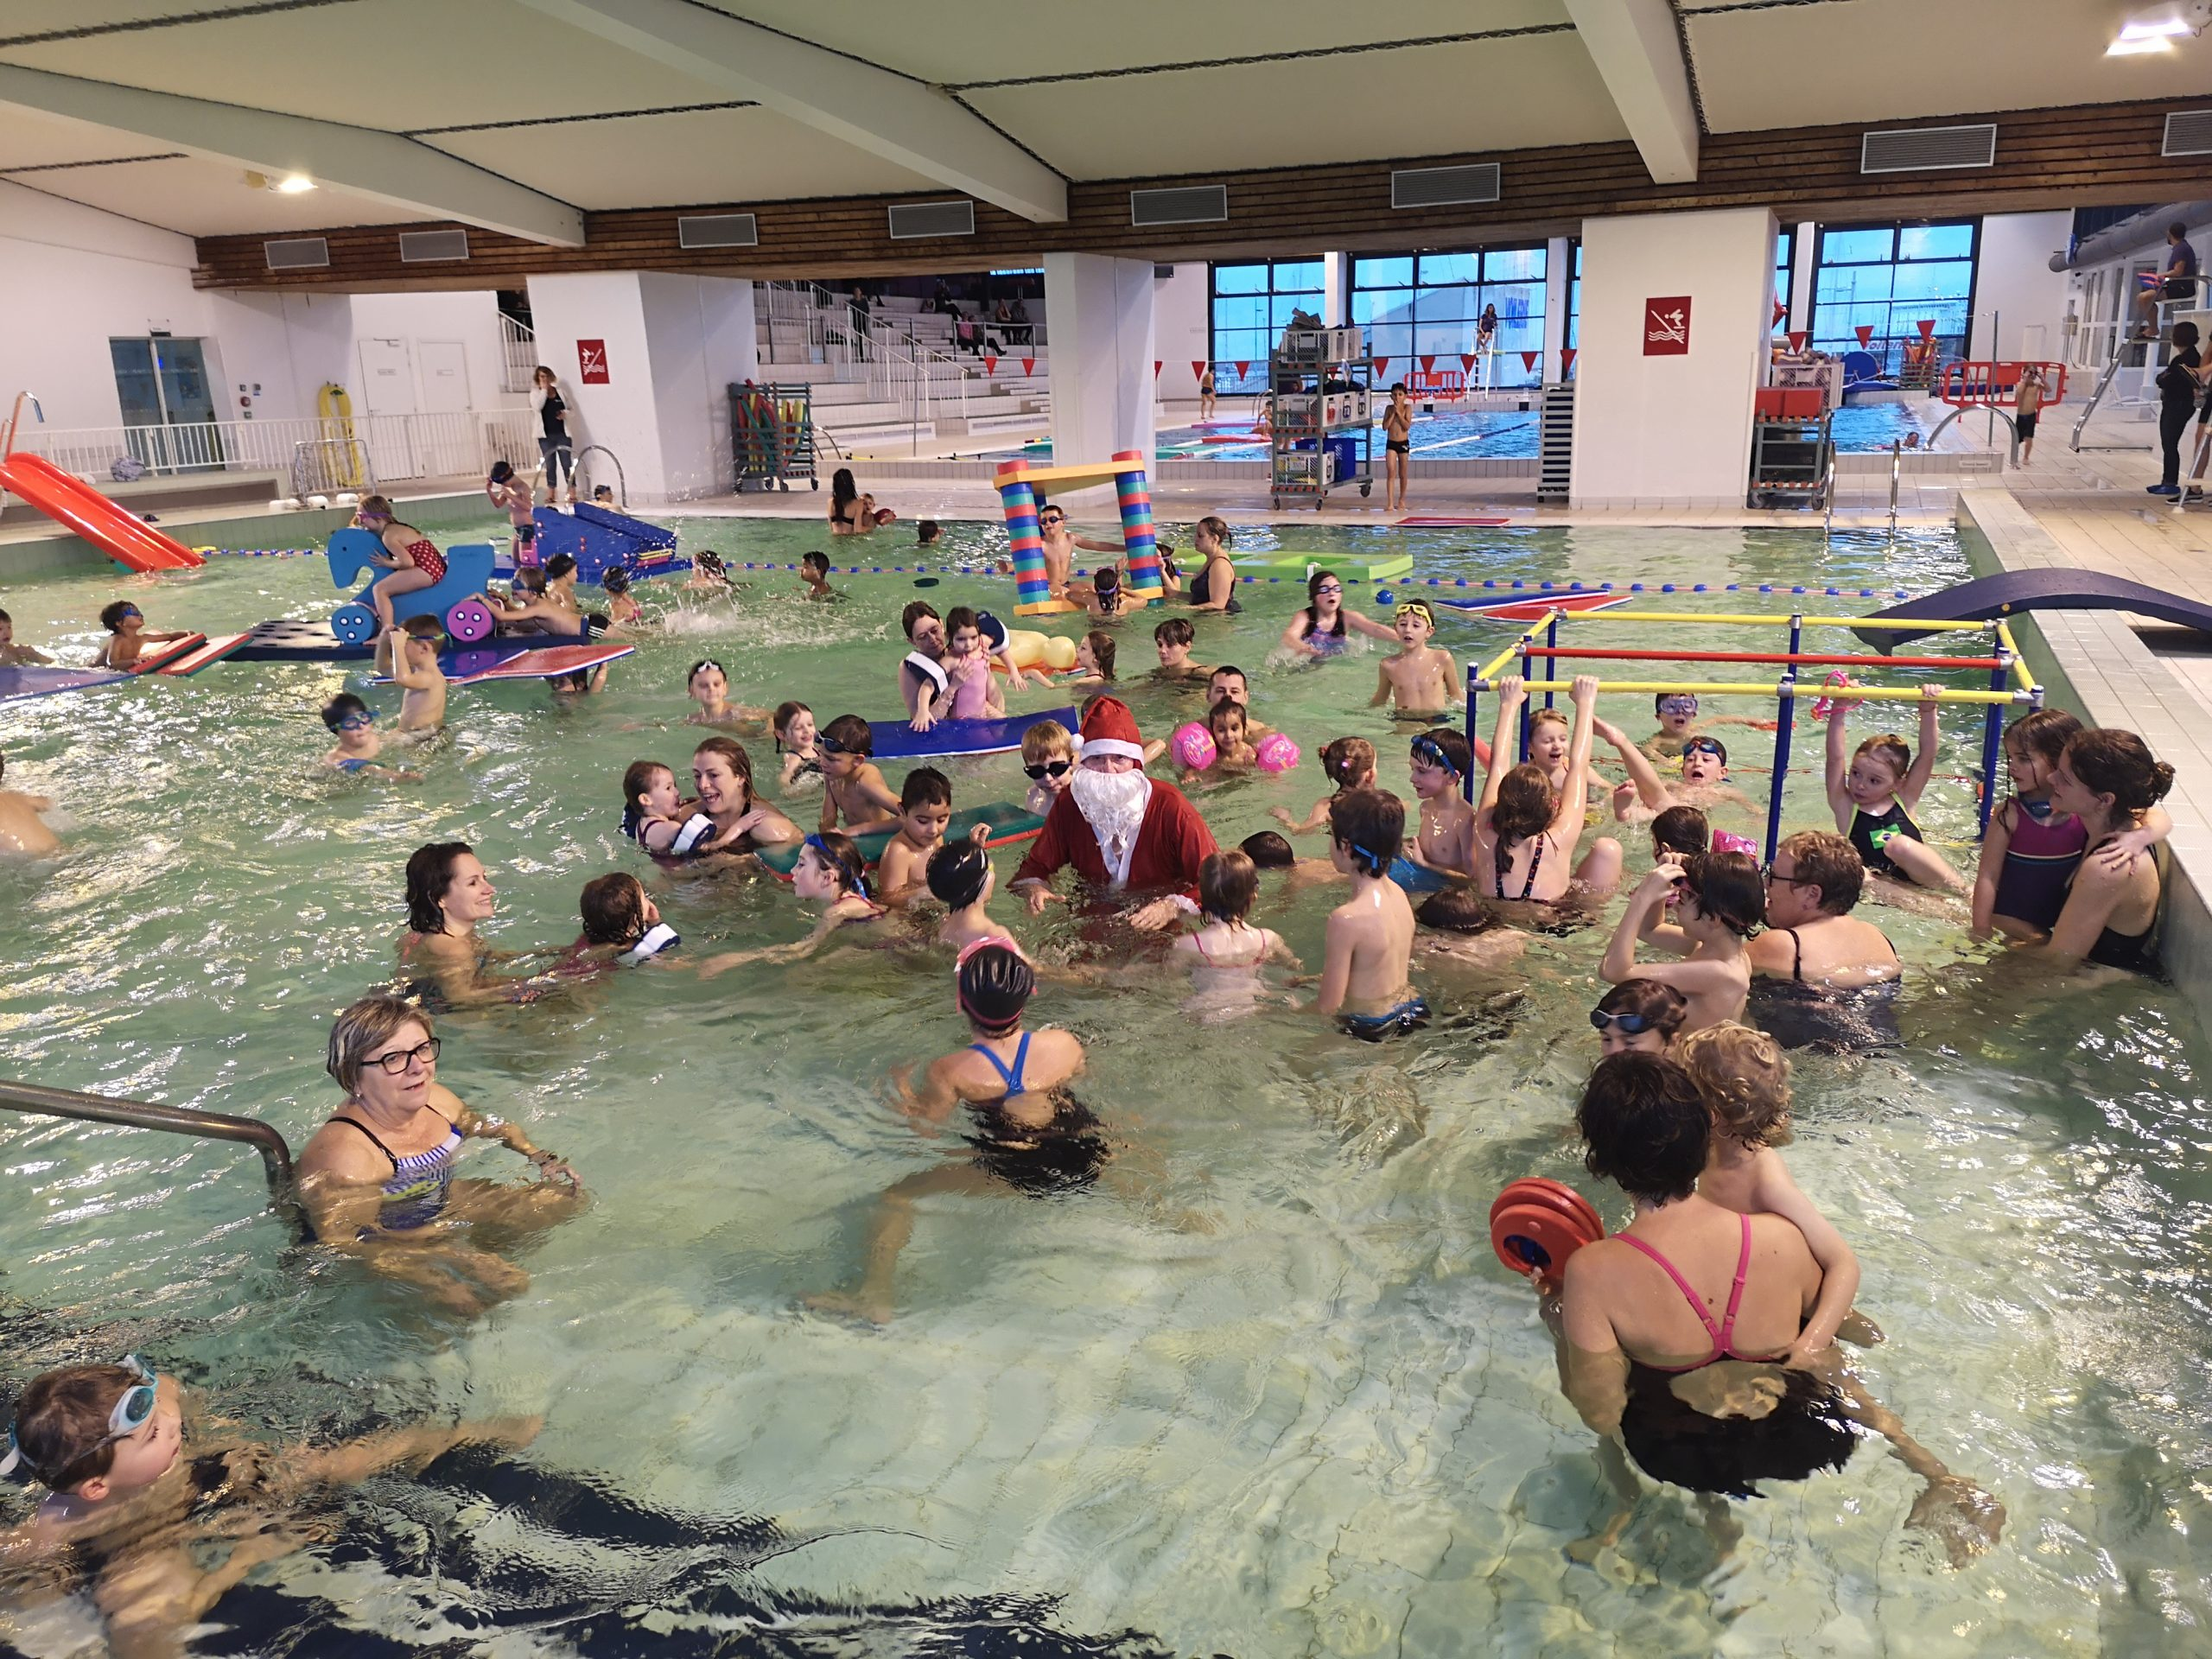 Aquagym, Aquafitness, Cours De Natation... Les Piscines De ... destiné Piscine Cherbourg